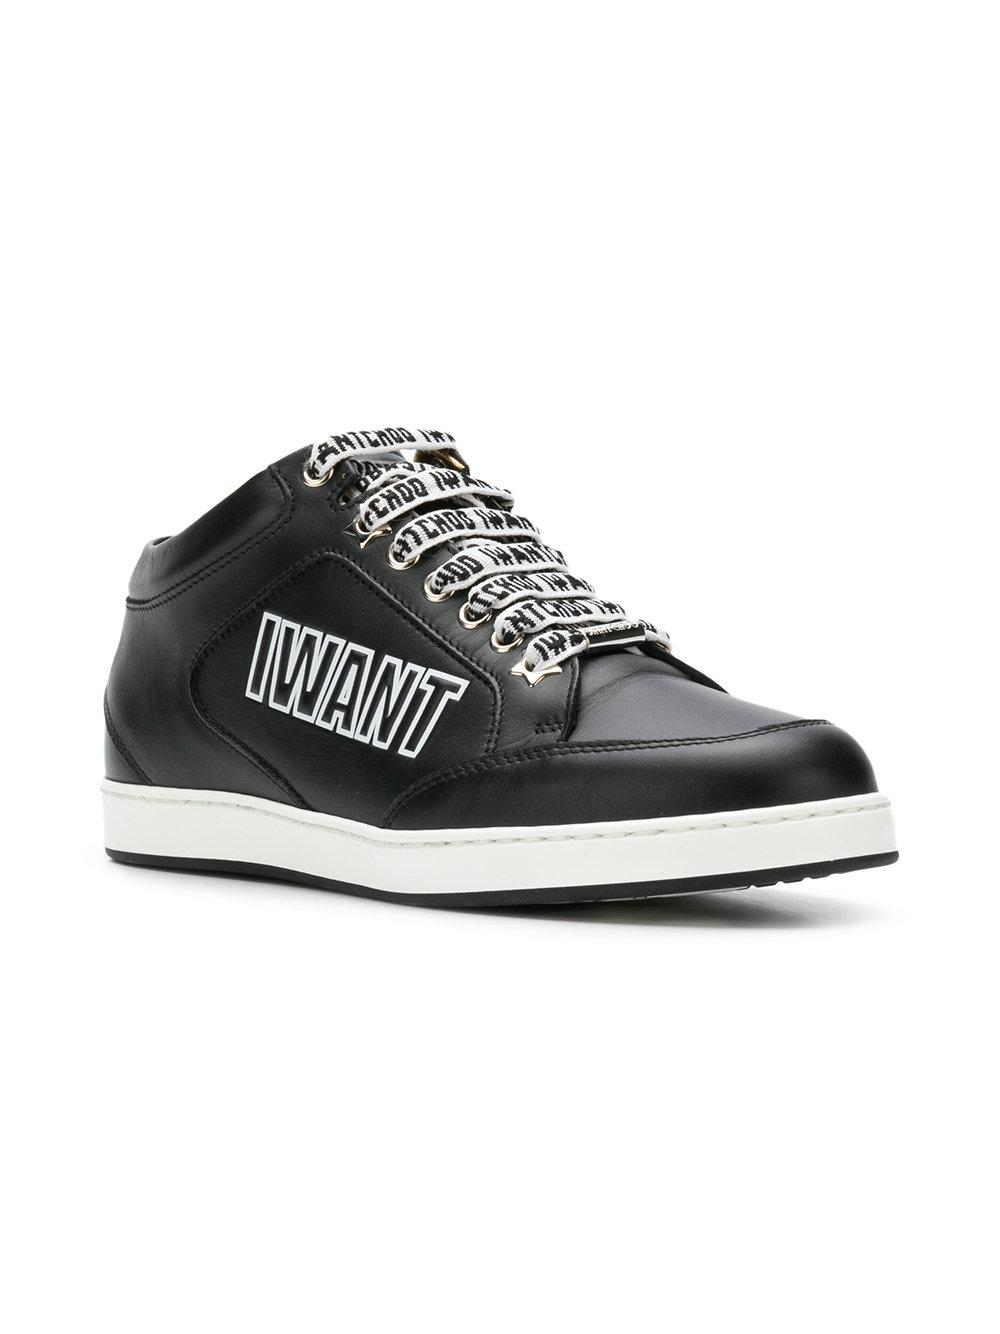 b779180e44d8 Lyst - Jimmy Choo Miami Sneakers in Black - Save 18%